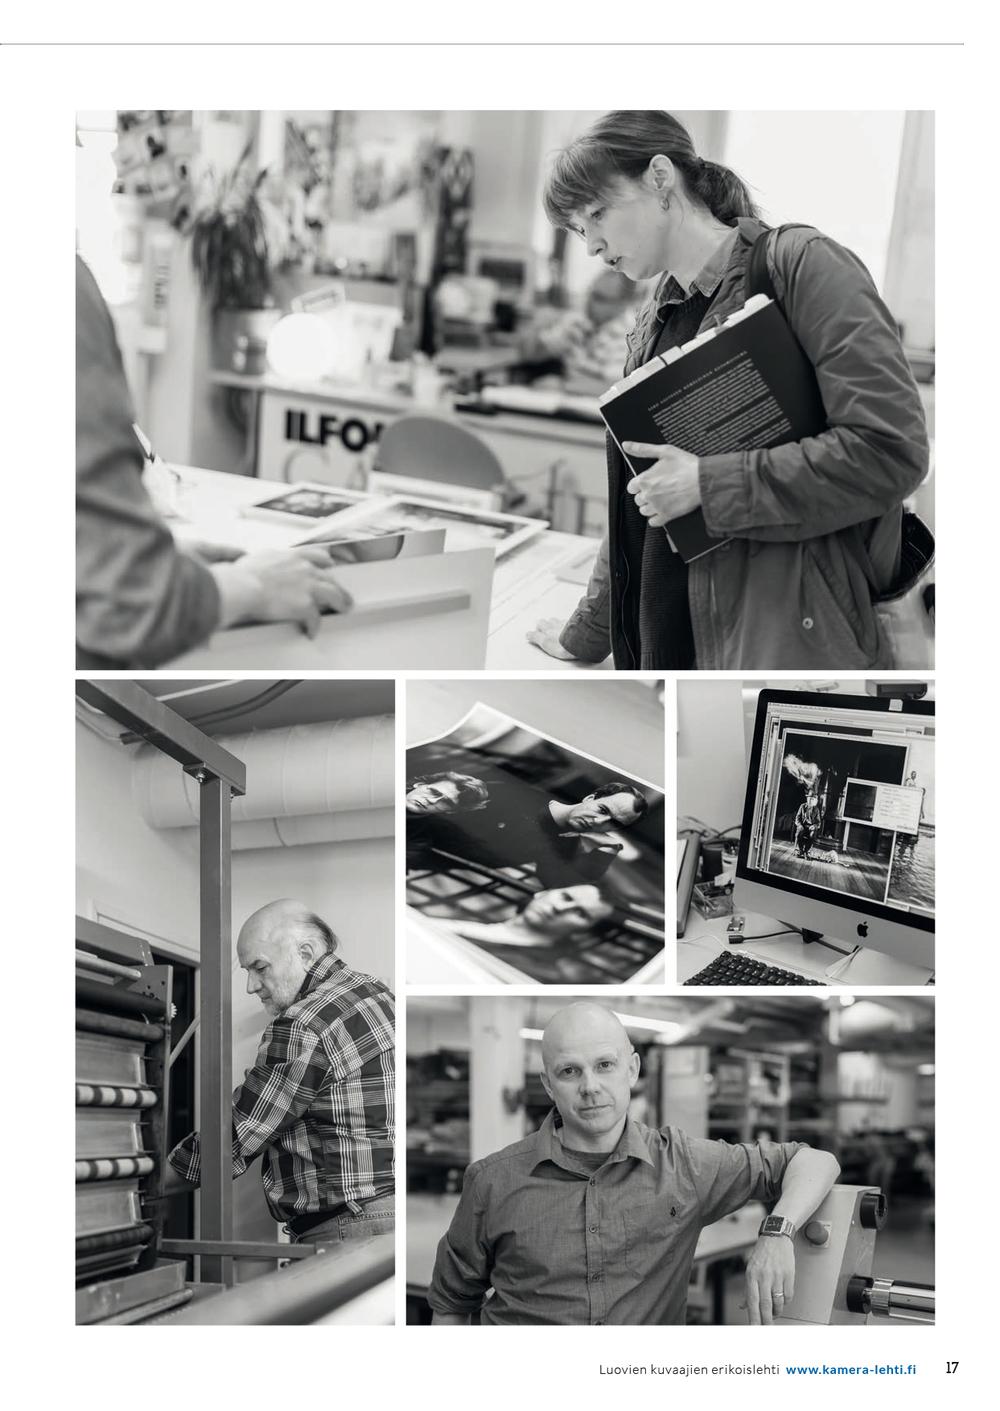 Kuvapäivä_Kamera-lehti_6-7-2014.pdf-2.jpg